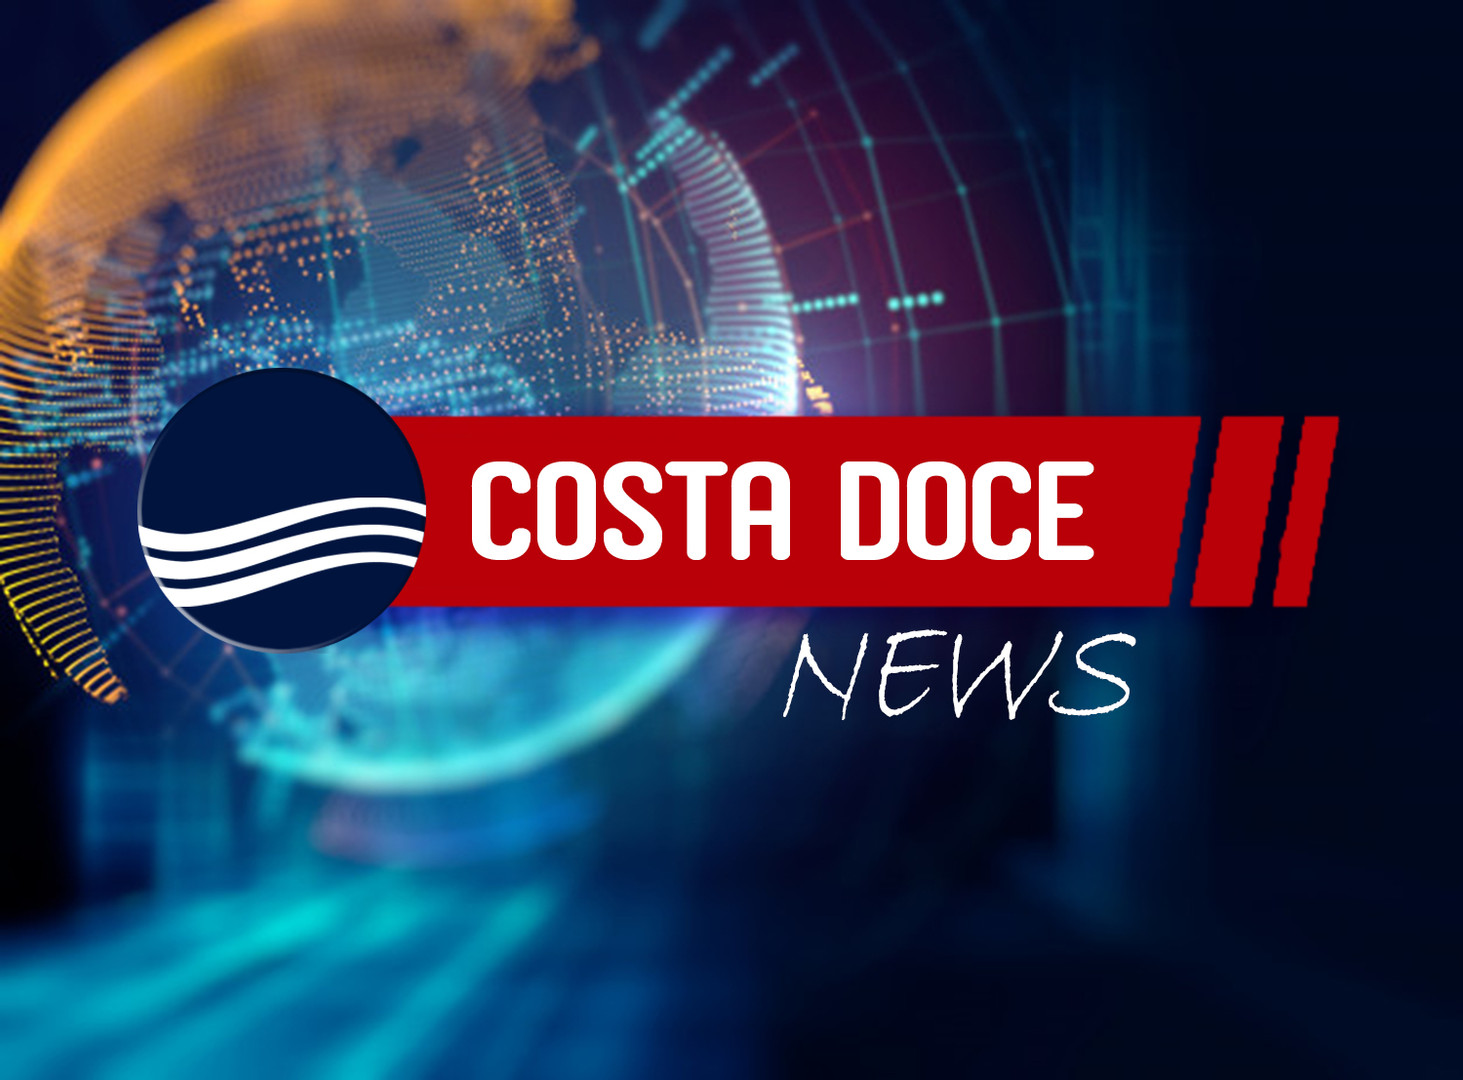 COSTA DOCE NEWS.jpg